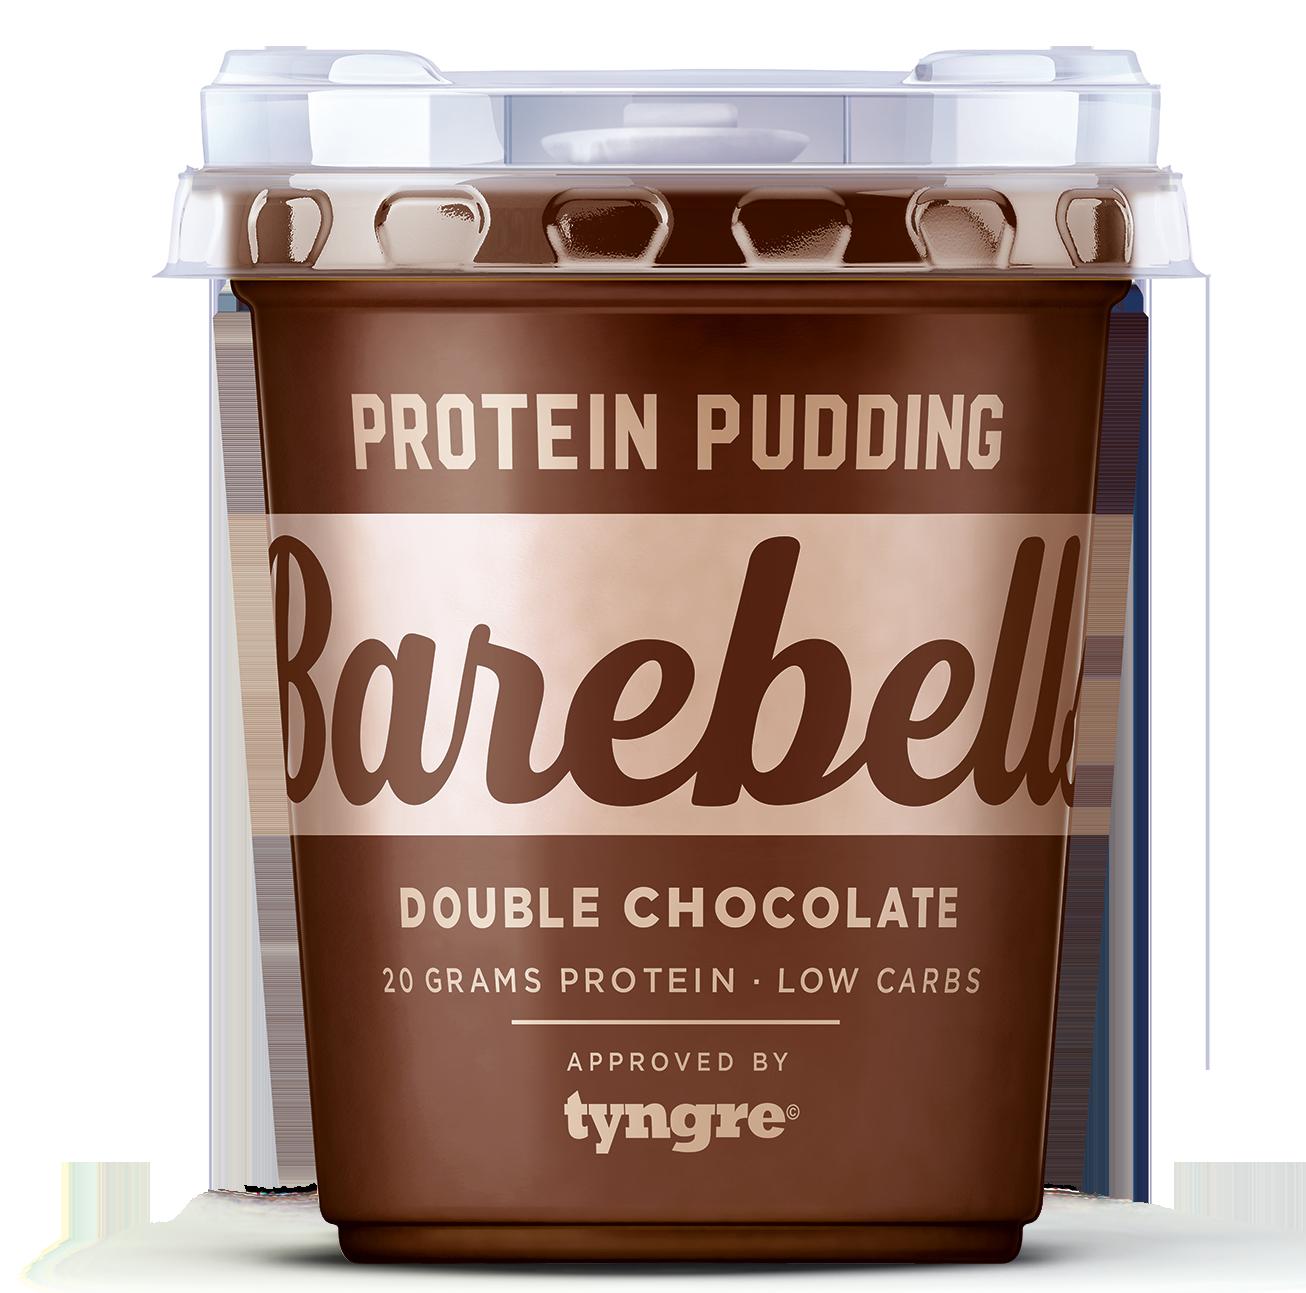 njie proteinpudding nyttig